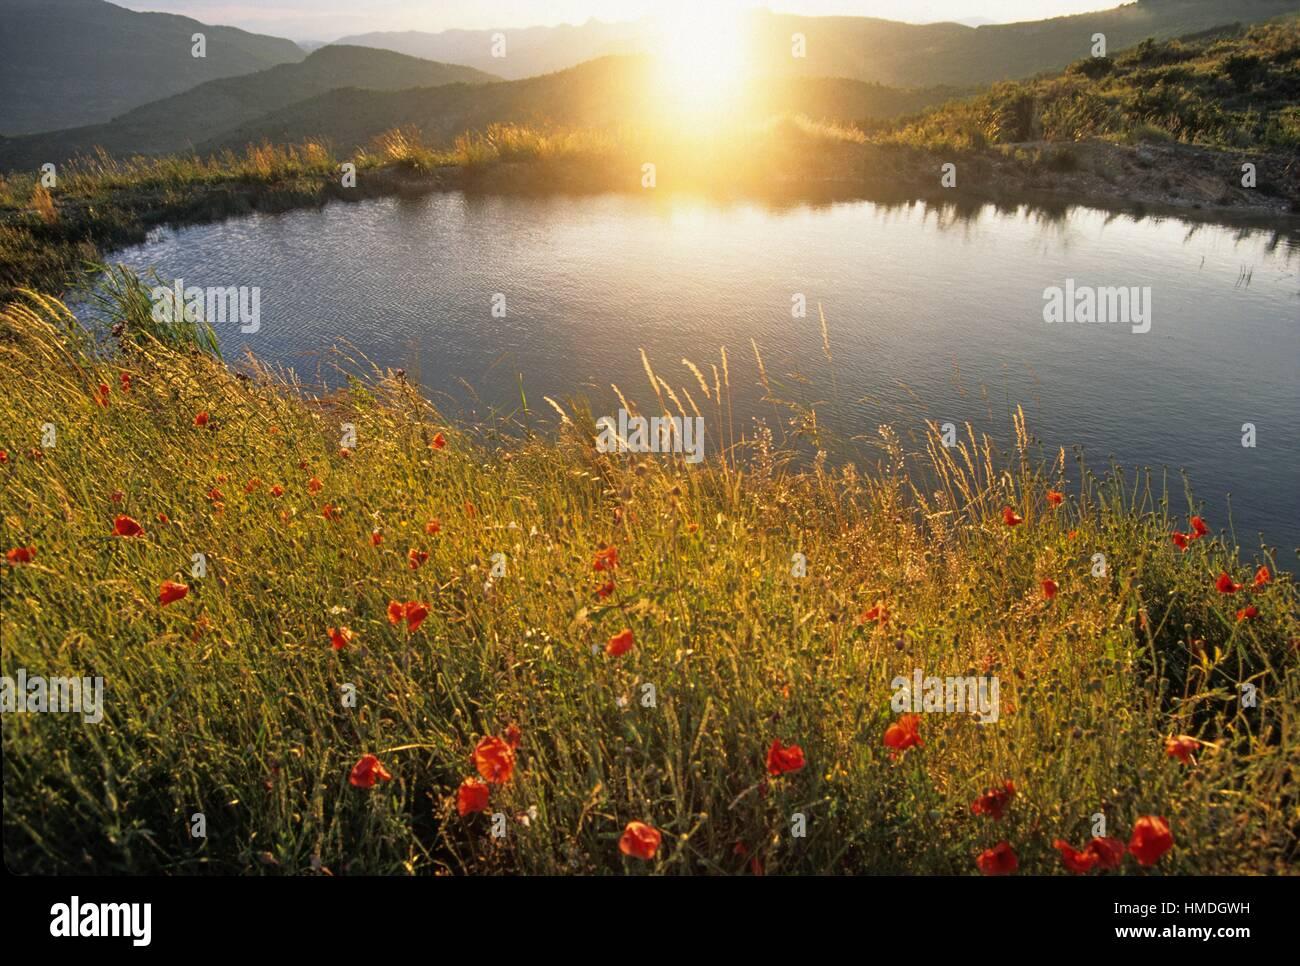 Drome department, region of Rhone-Alpes, southeastern France, Europe. - Stock Image